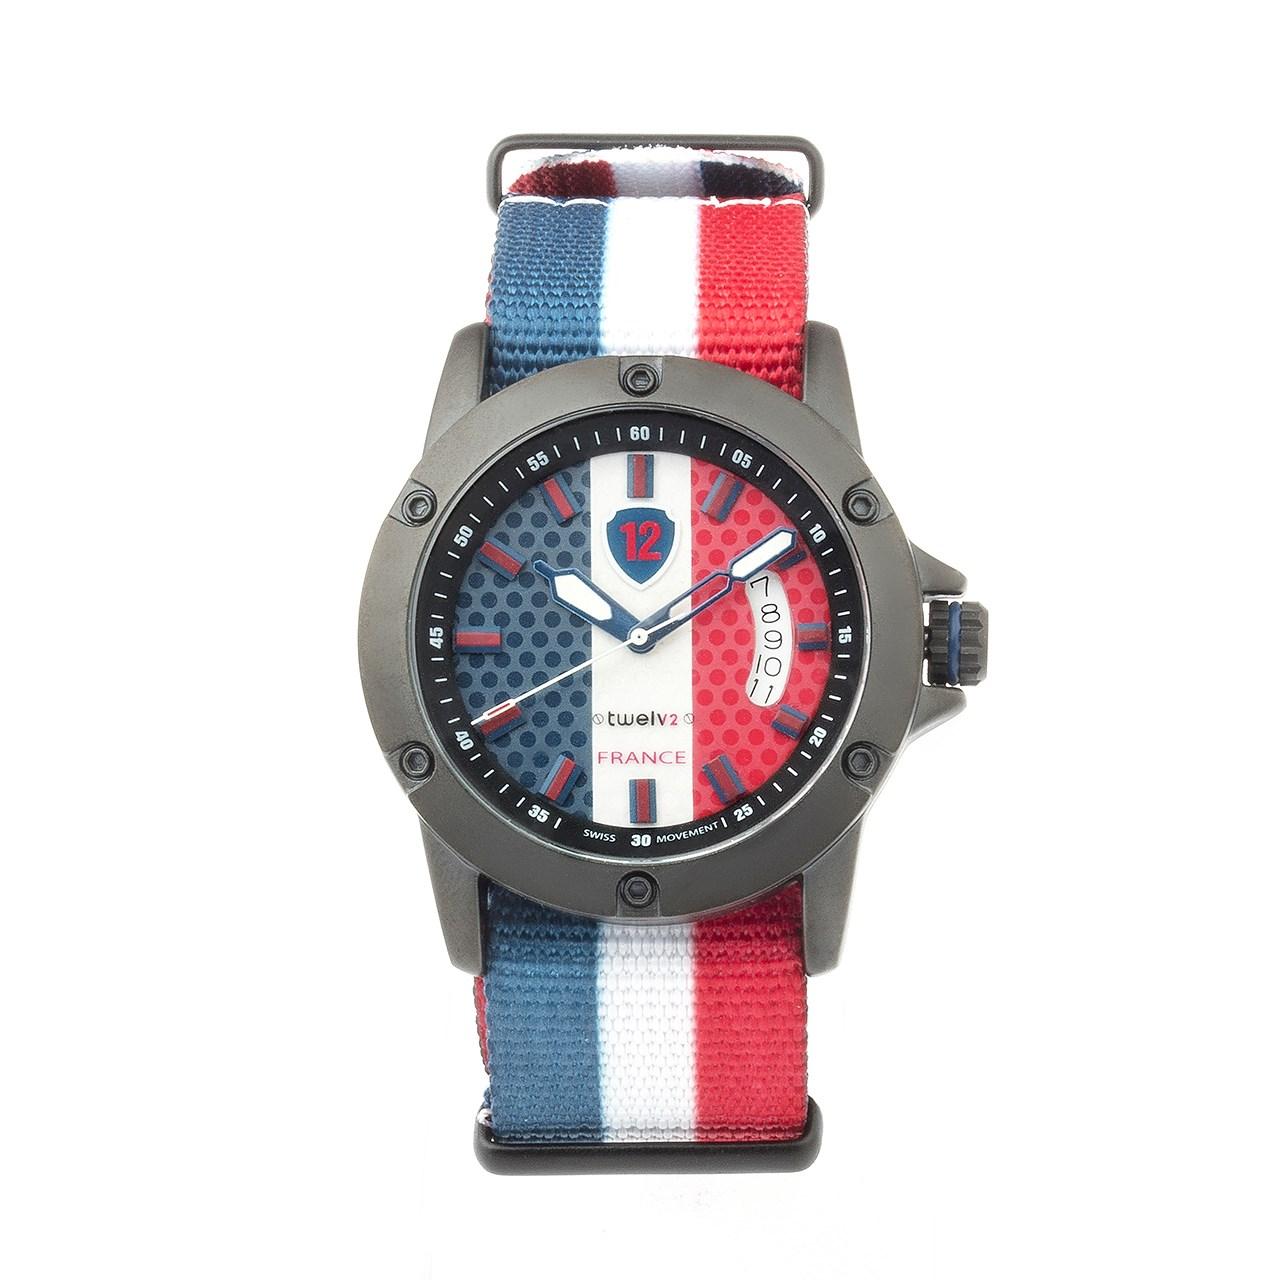 ساعت مچی عقربه ای توولو طرح پرچم فرانسه 6